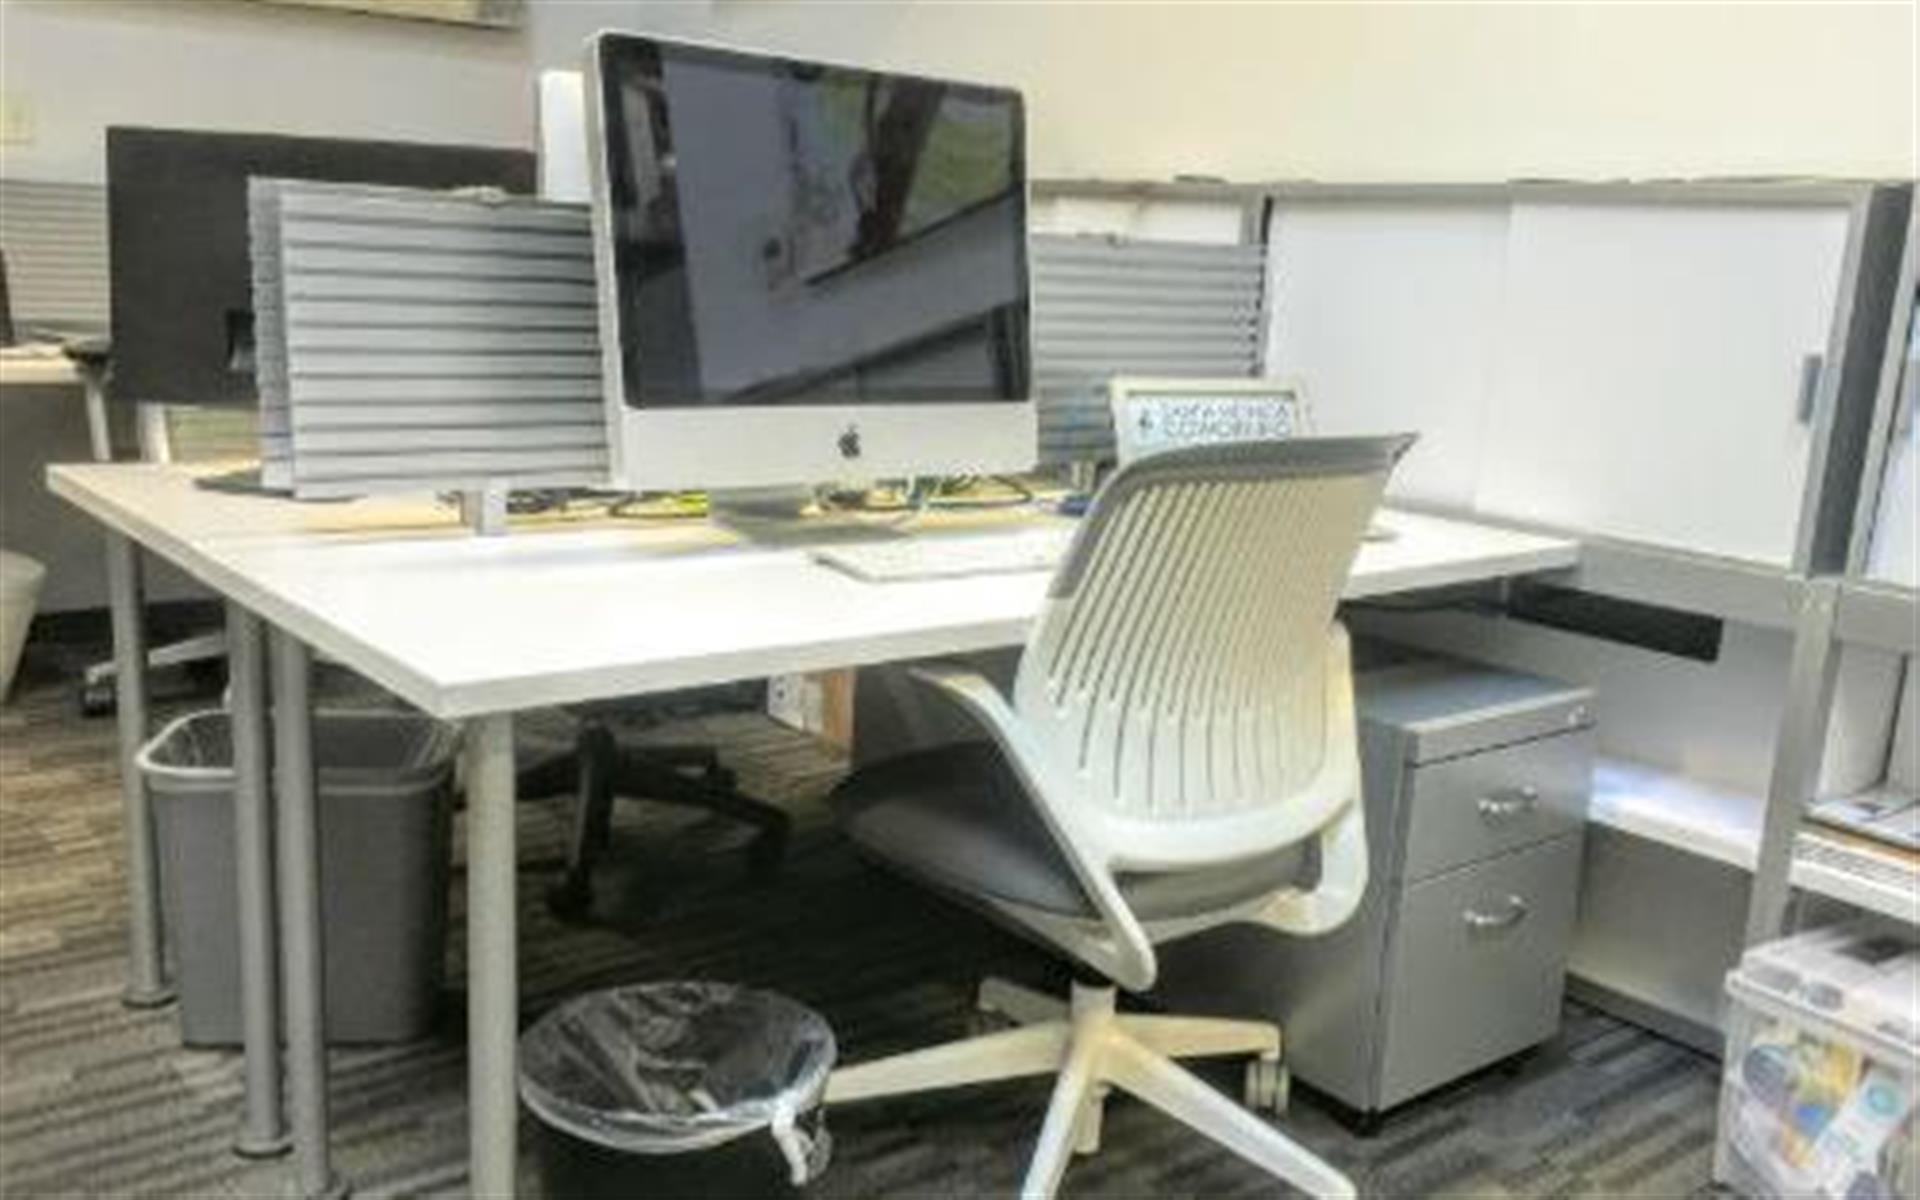 SAMOCO: Santa Monica Coworking - Dedicated Desk (Copy)